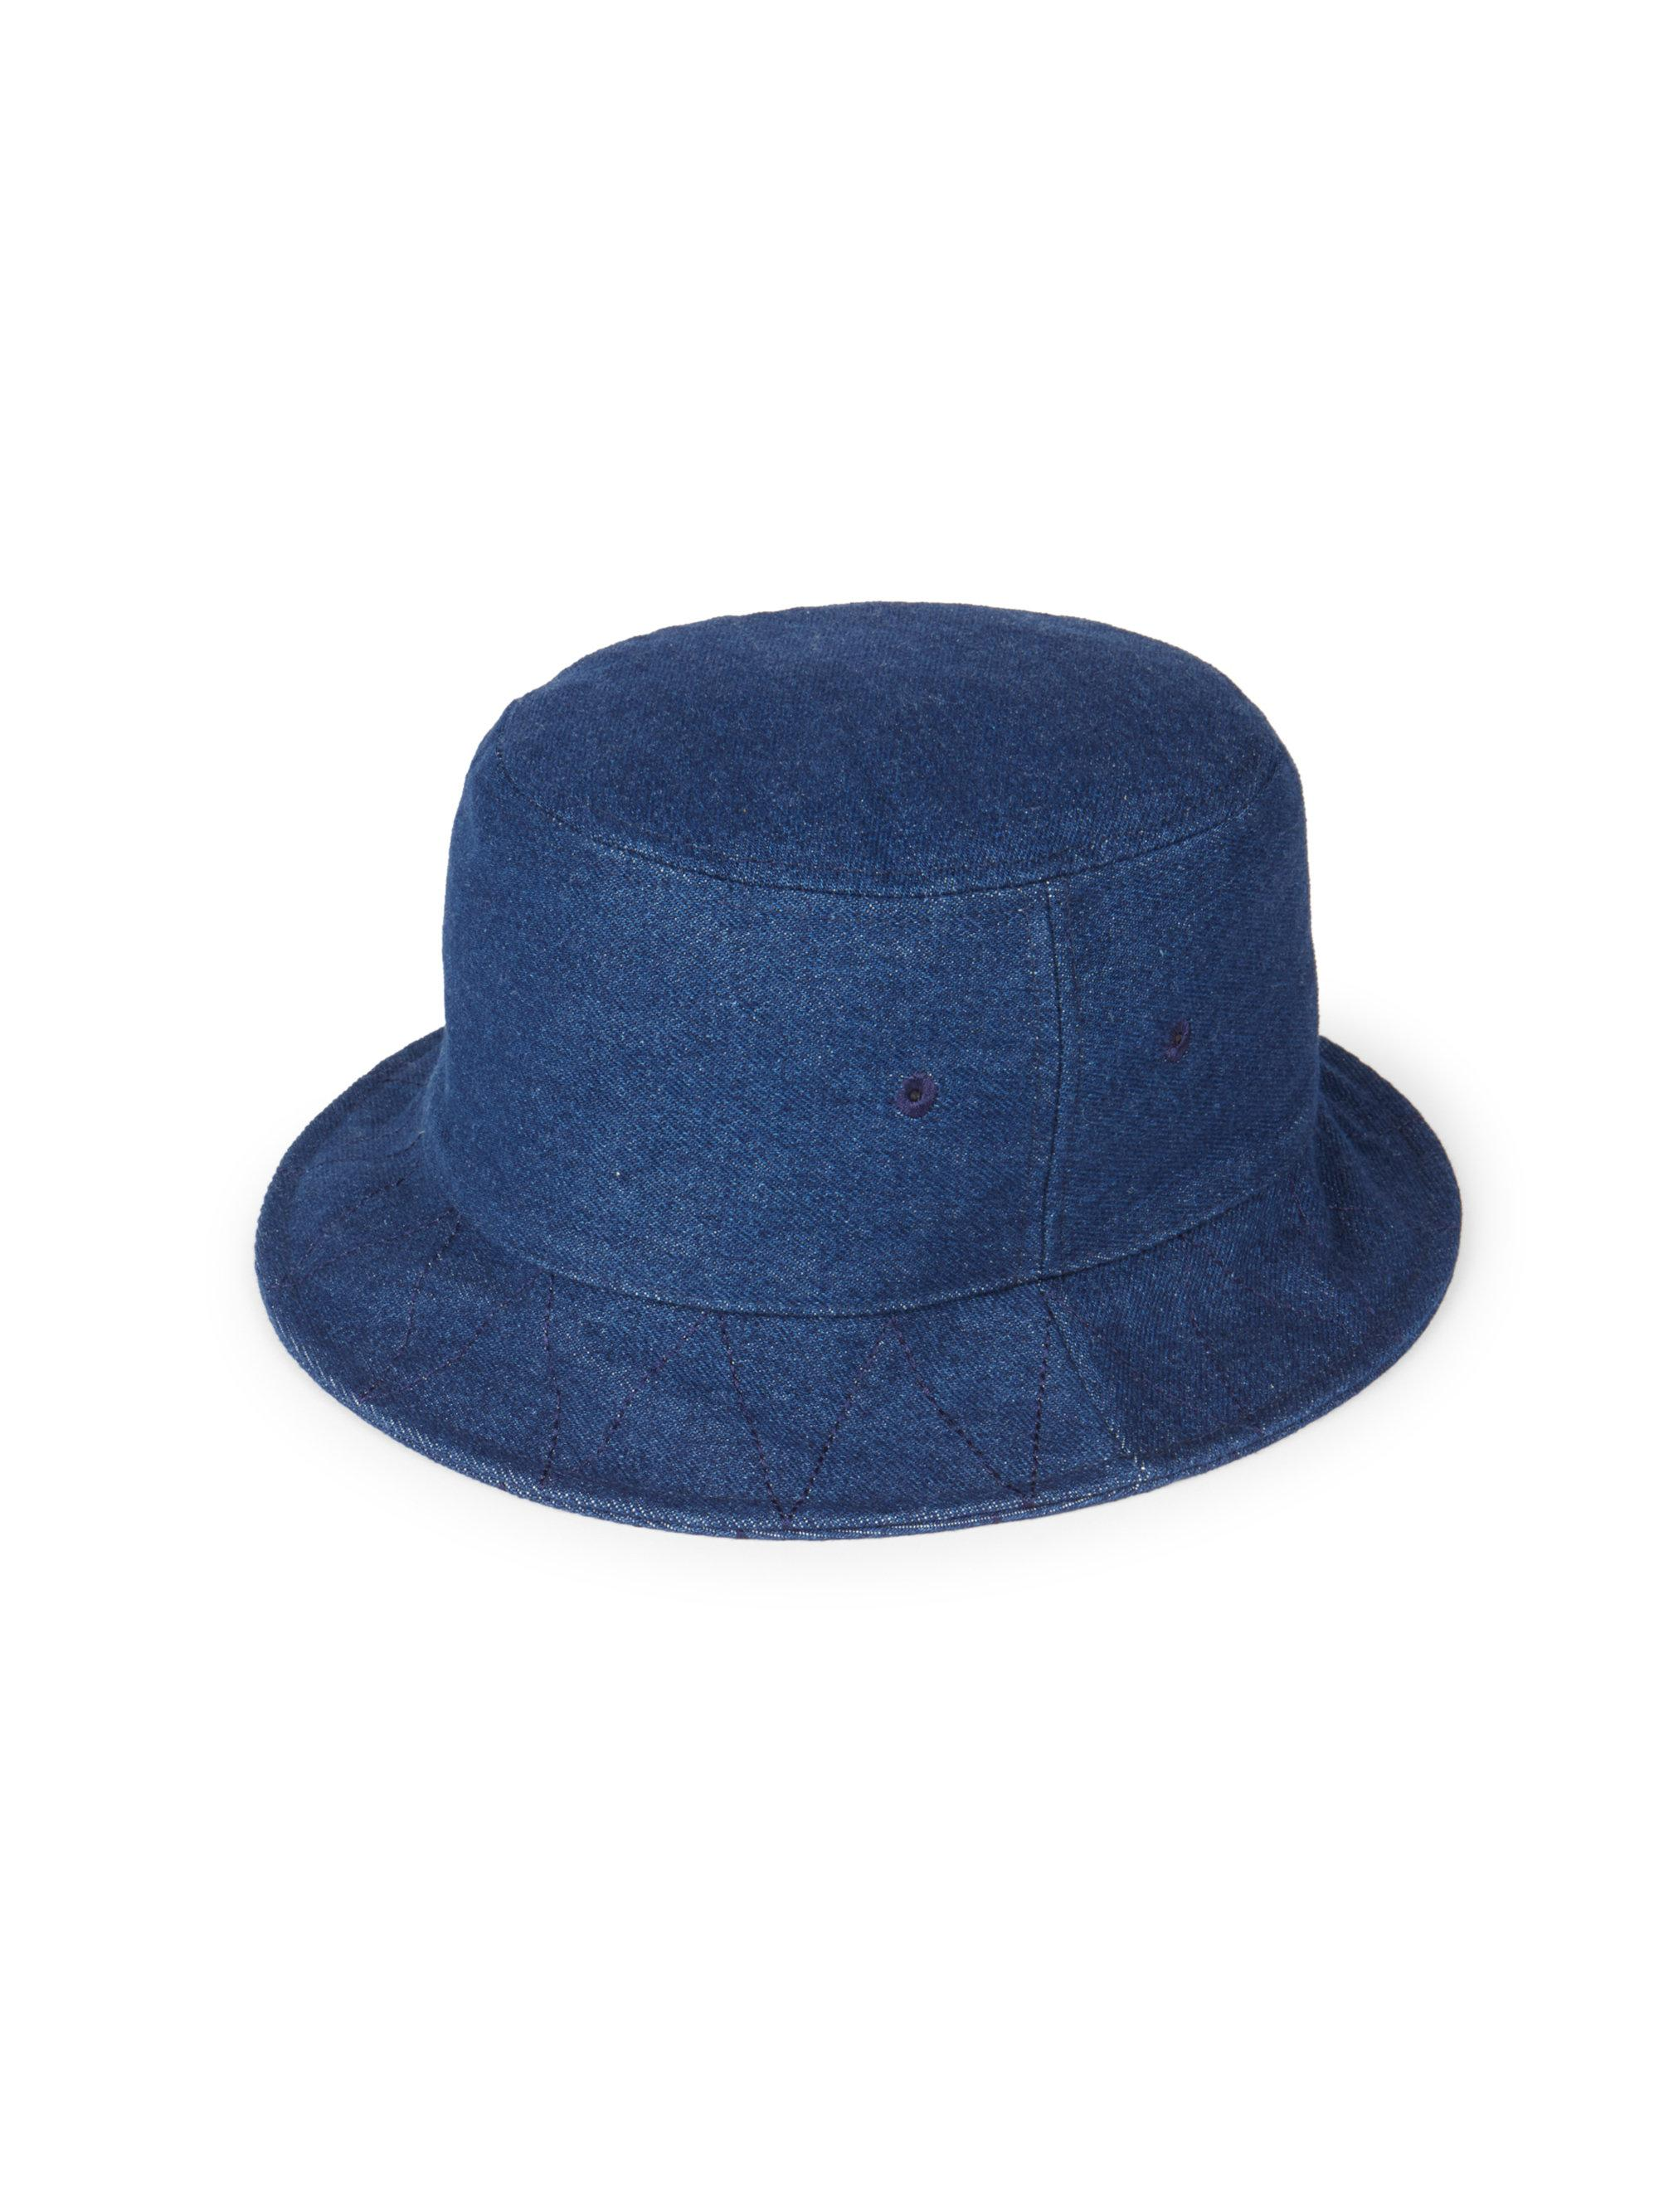 737f9d2c42054 Lyst - AMI Men s Wool Bowler Hat - Indigo in Blue for Men